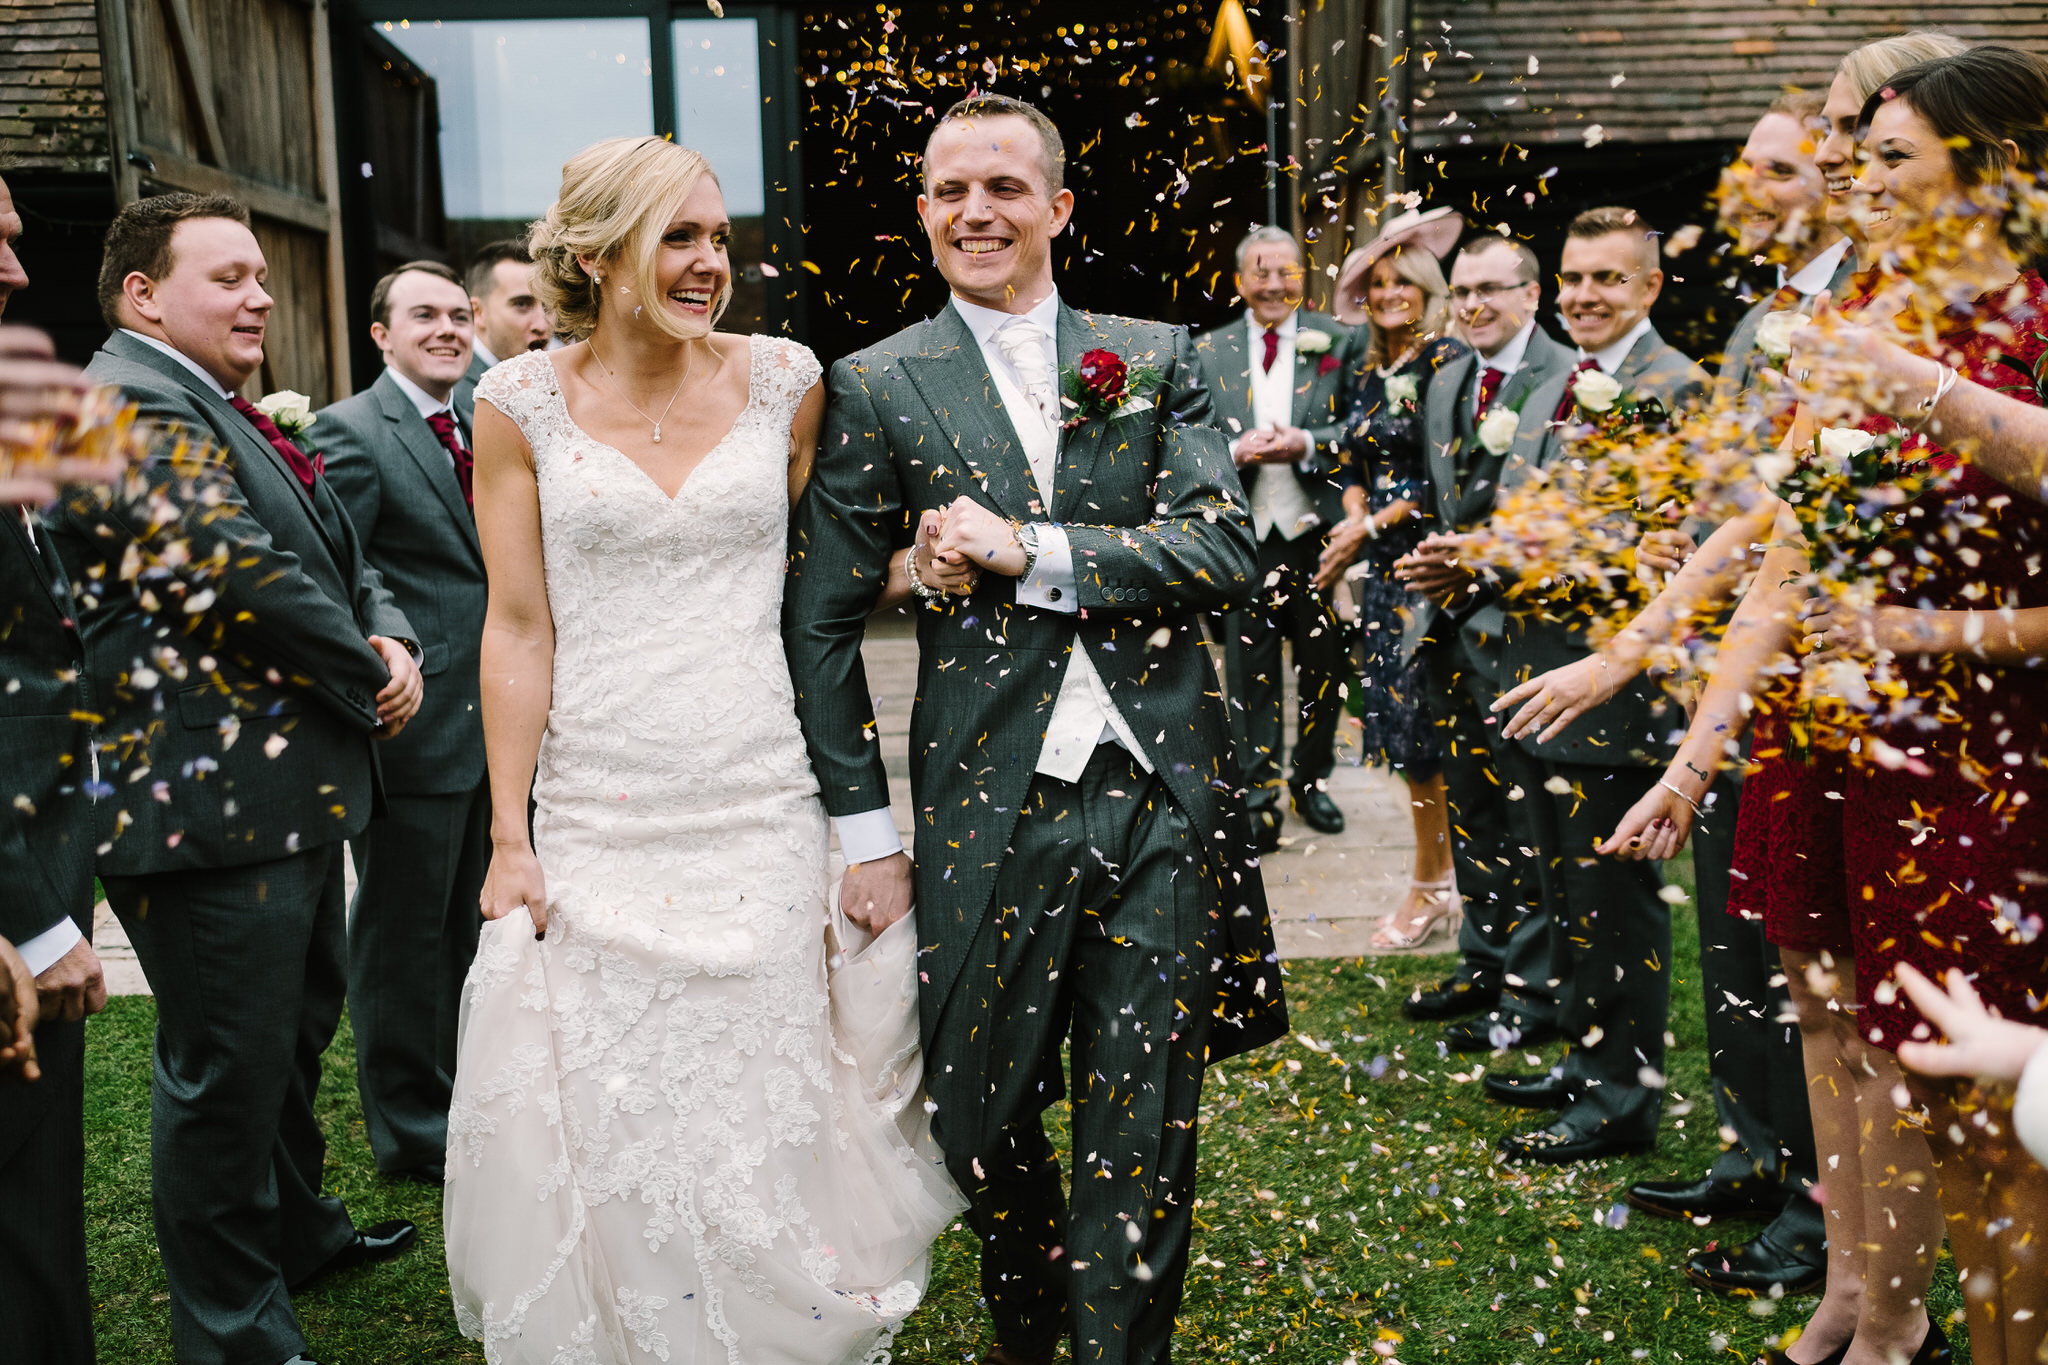 The bride and groom in confetti outside Lains Barn Wedding Venue, Oxfordshire